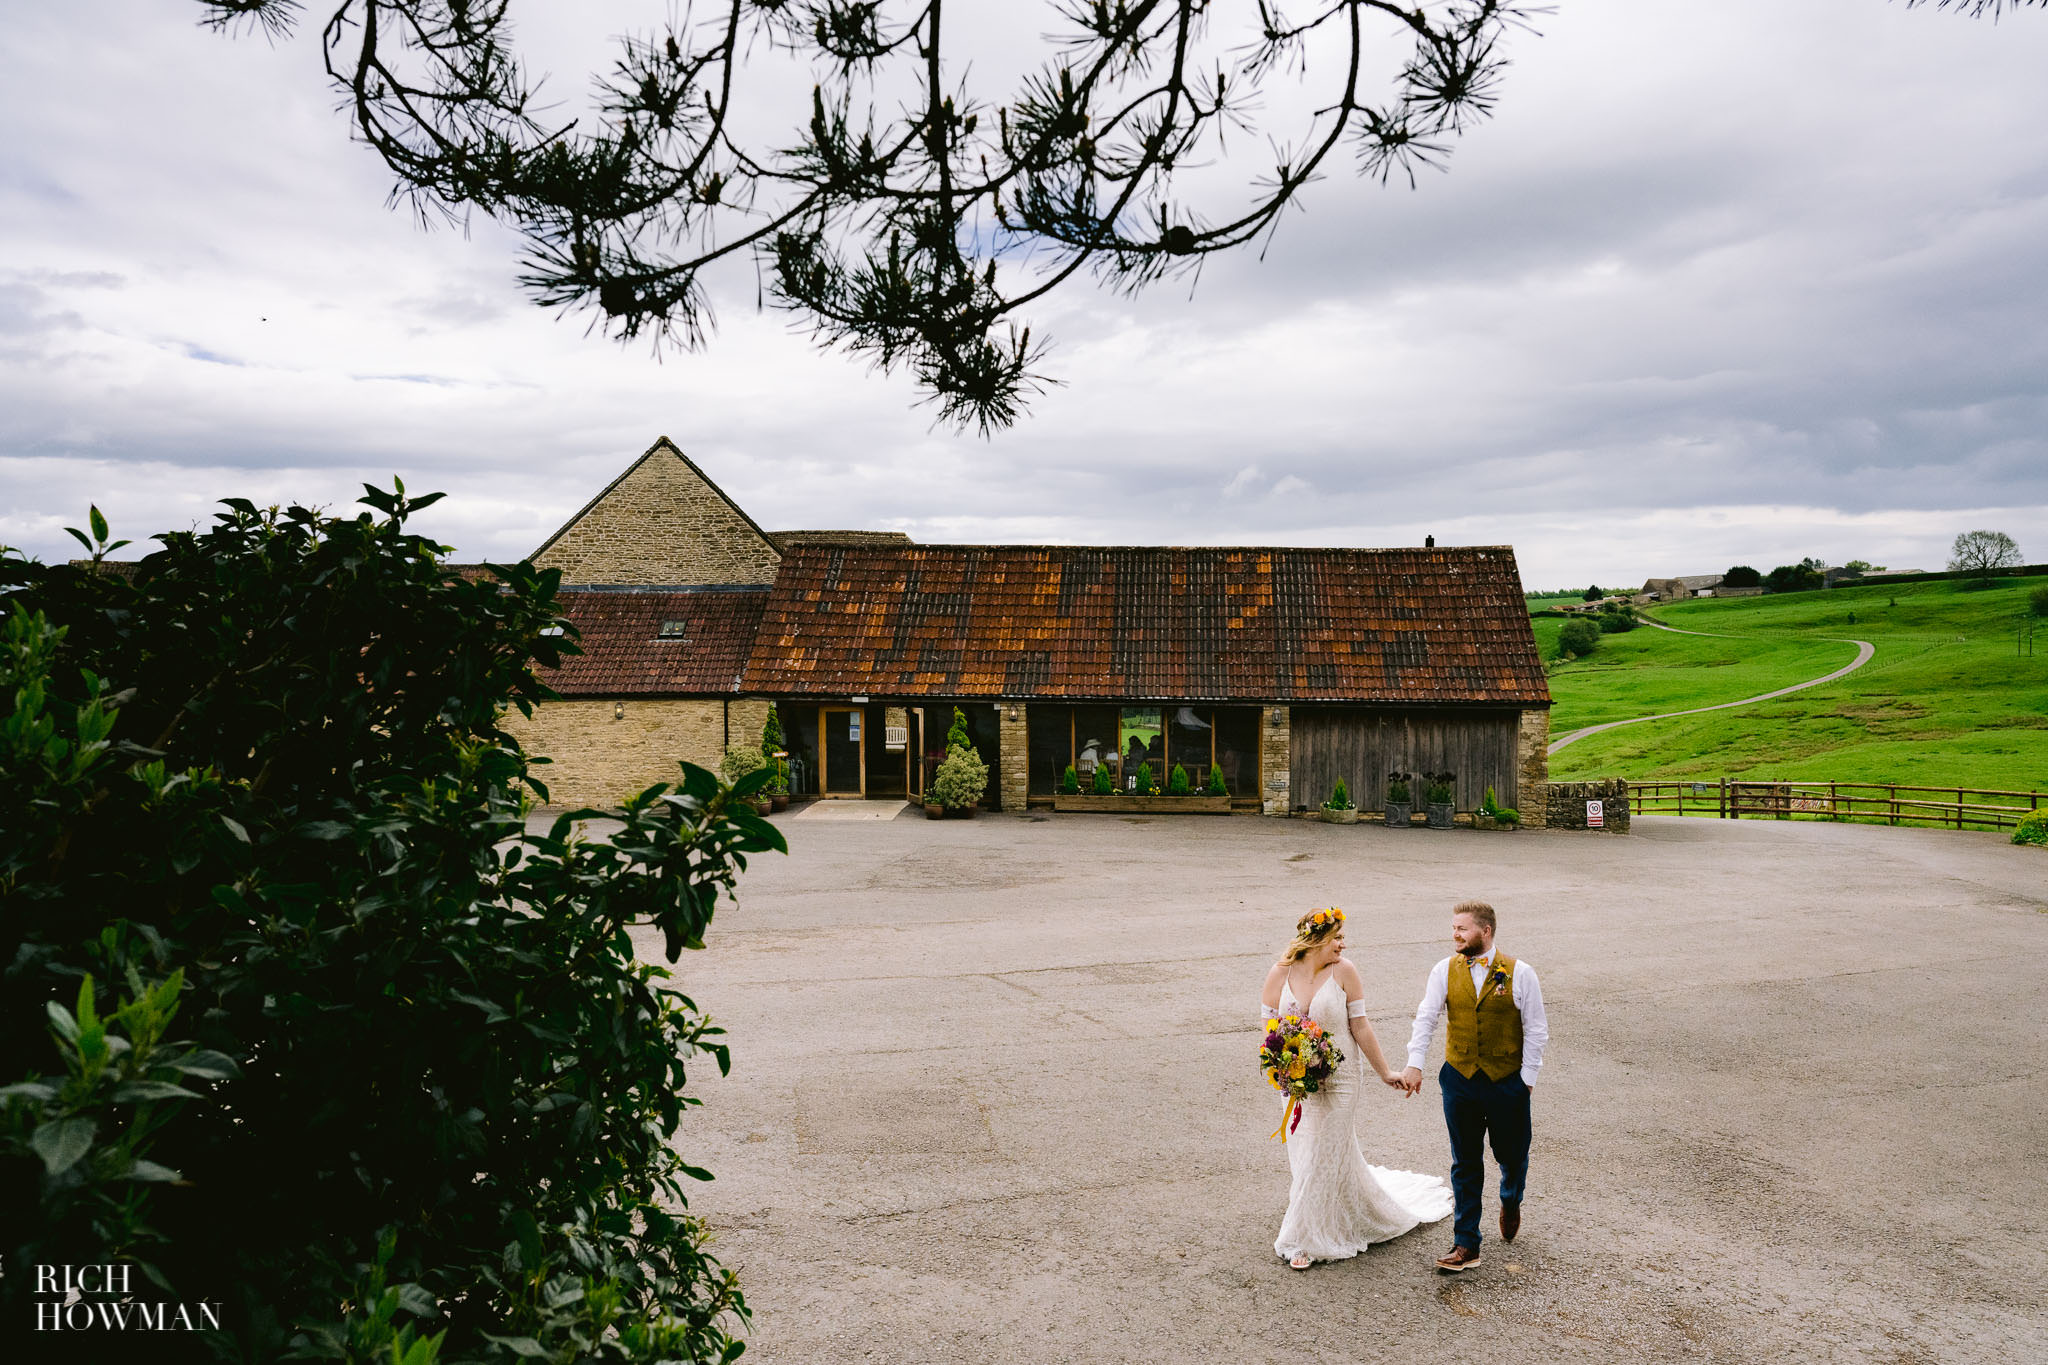 Kingscote Barn Wedding Photographer 3